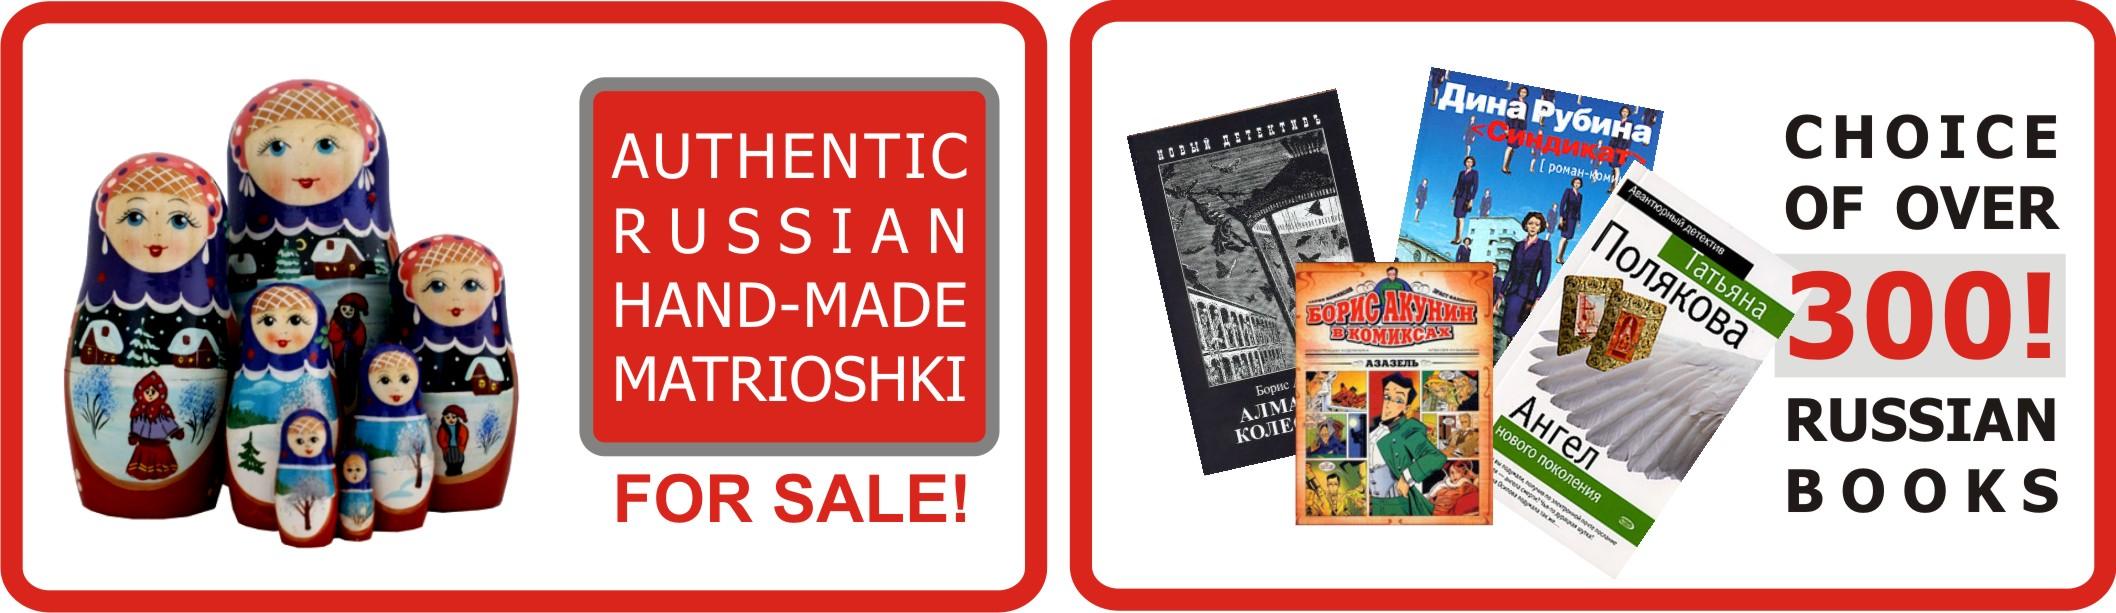 Russia Online Bookstore - Russia Online Bookstore